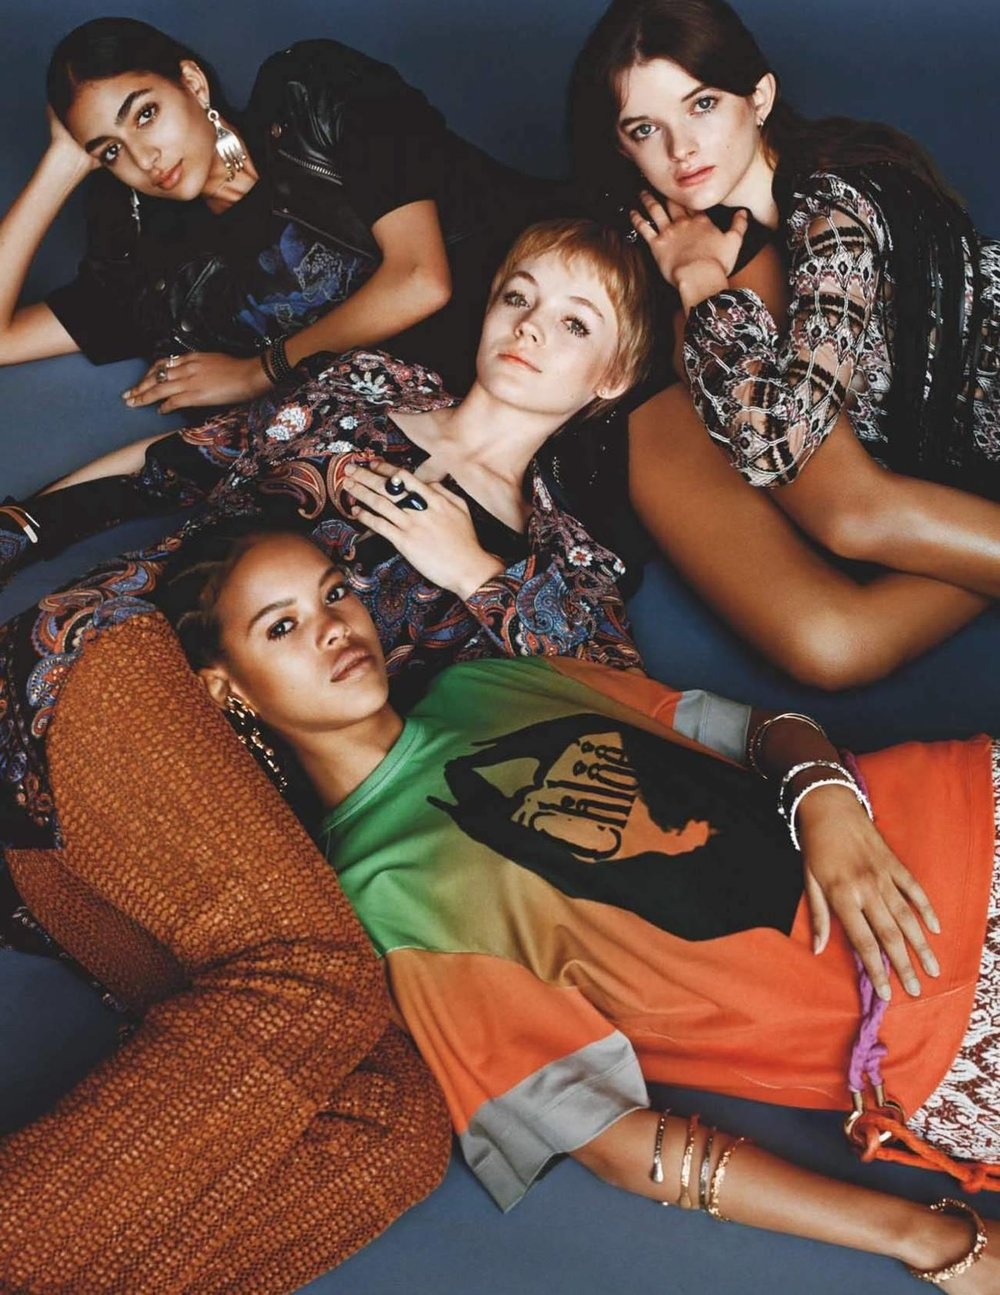 Alasdair McLellan 'Spring Fever' Vogue UK Feb 2019 (1).jpg